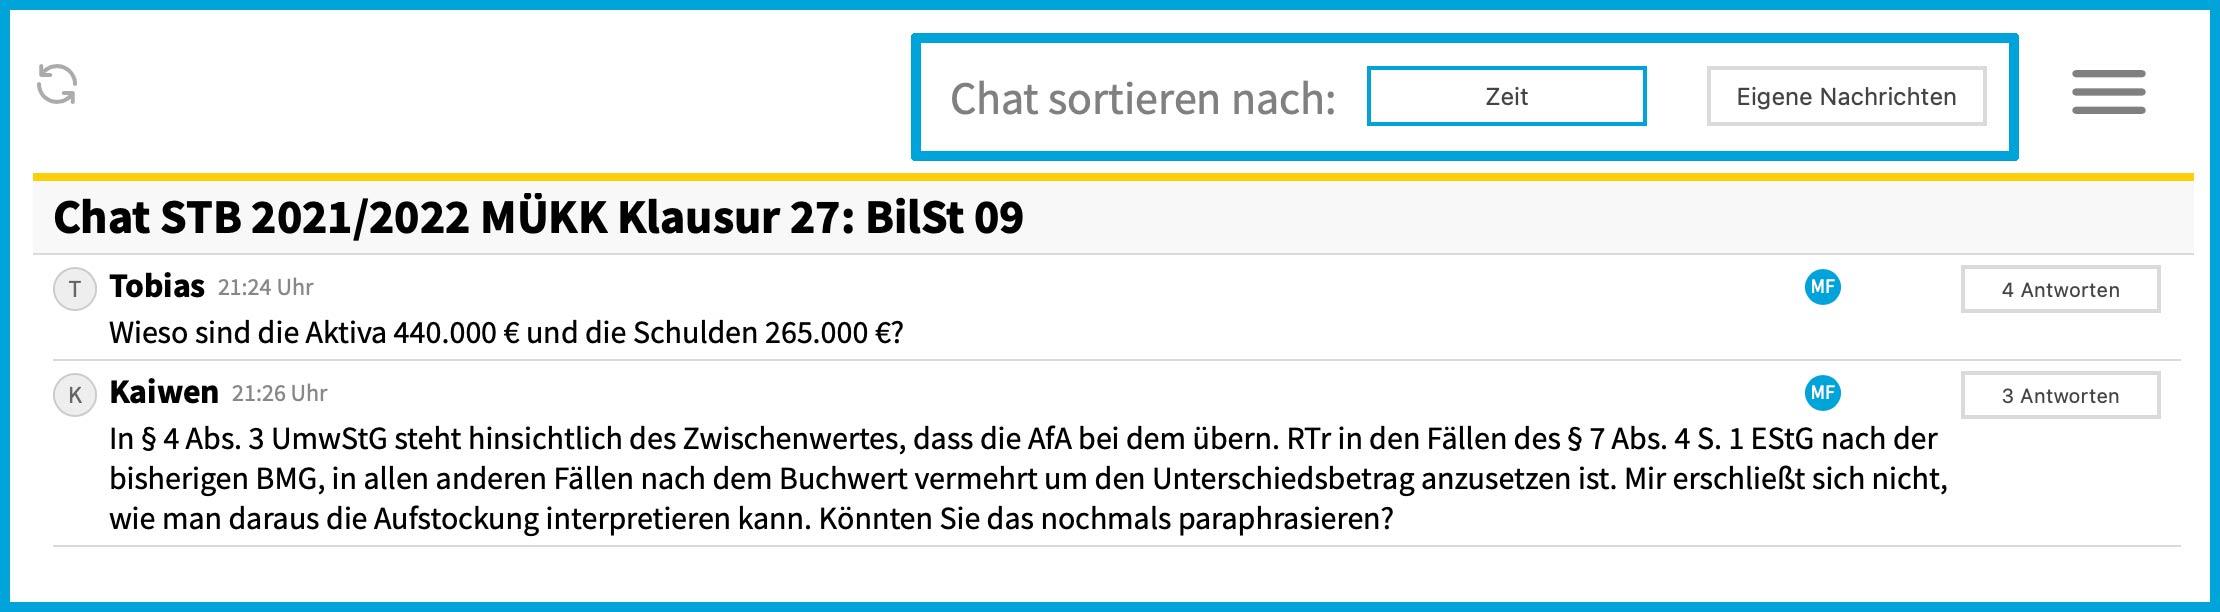 knoll_digital_chat012.jpg